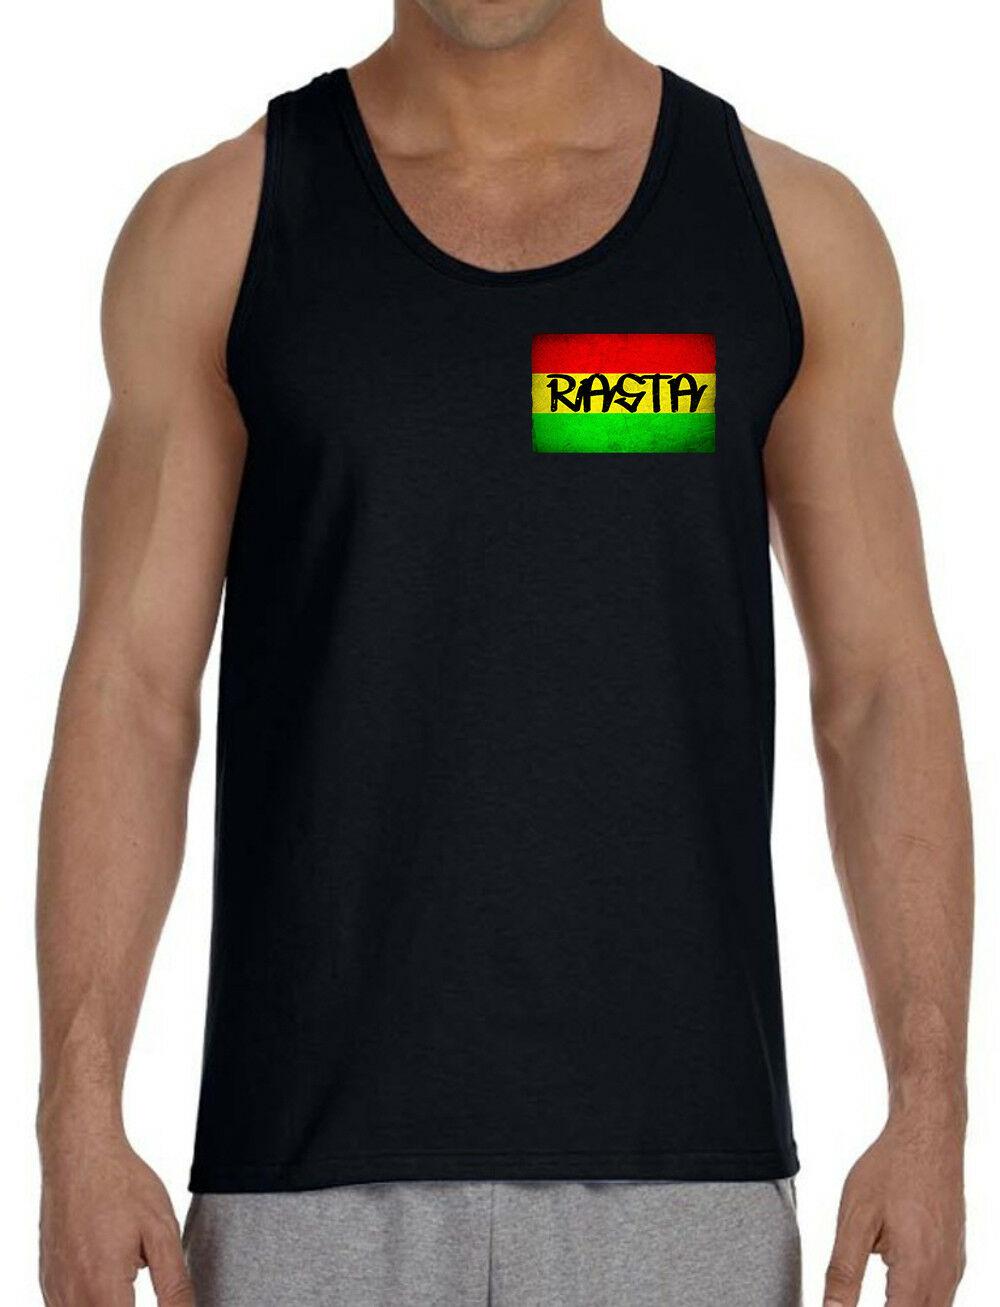 Men's Rasta Flag Chest Black Tank Top T-Shirt Jamaican Weed Blunt High Marijuana 1